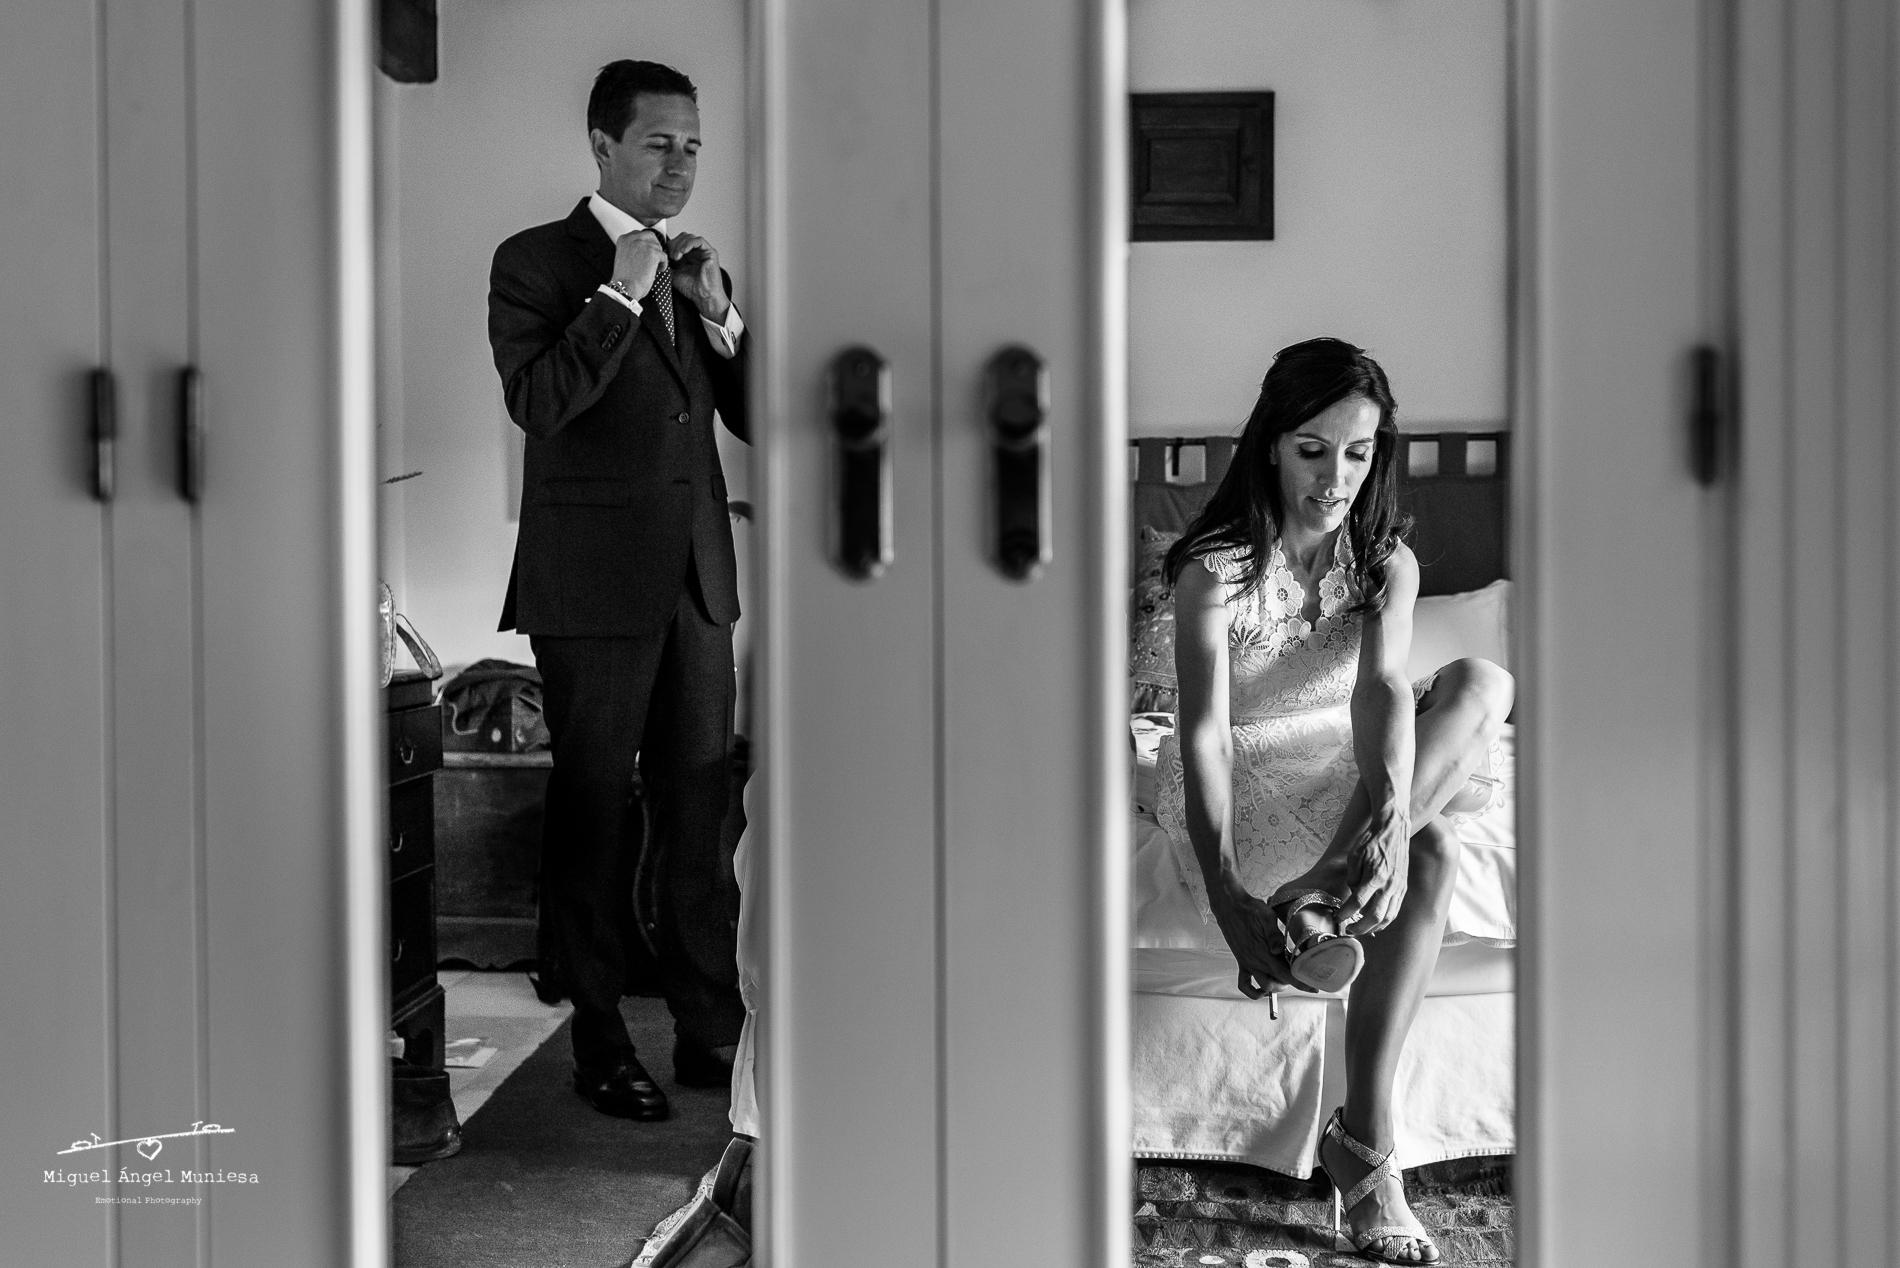 fotografo boda zaragoza, miguel angel muniesa_12